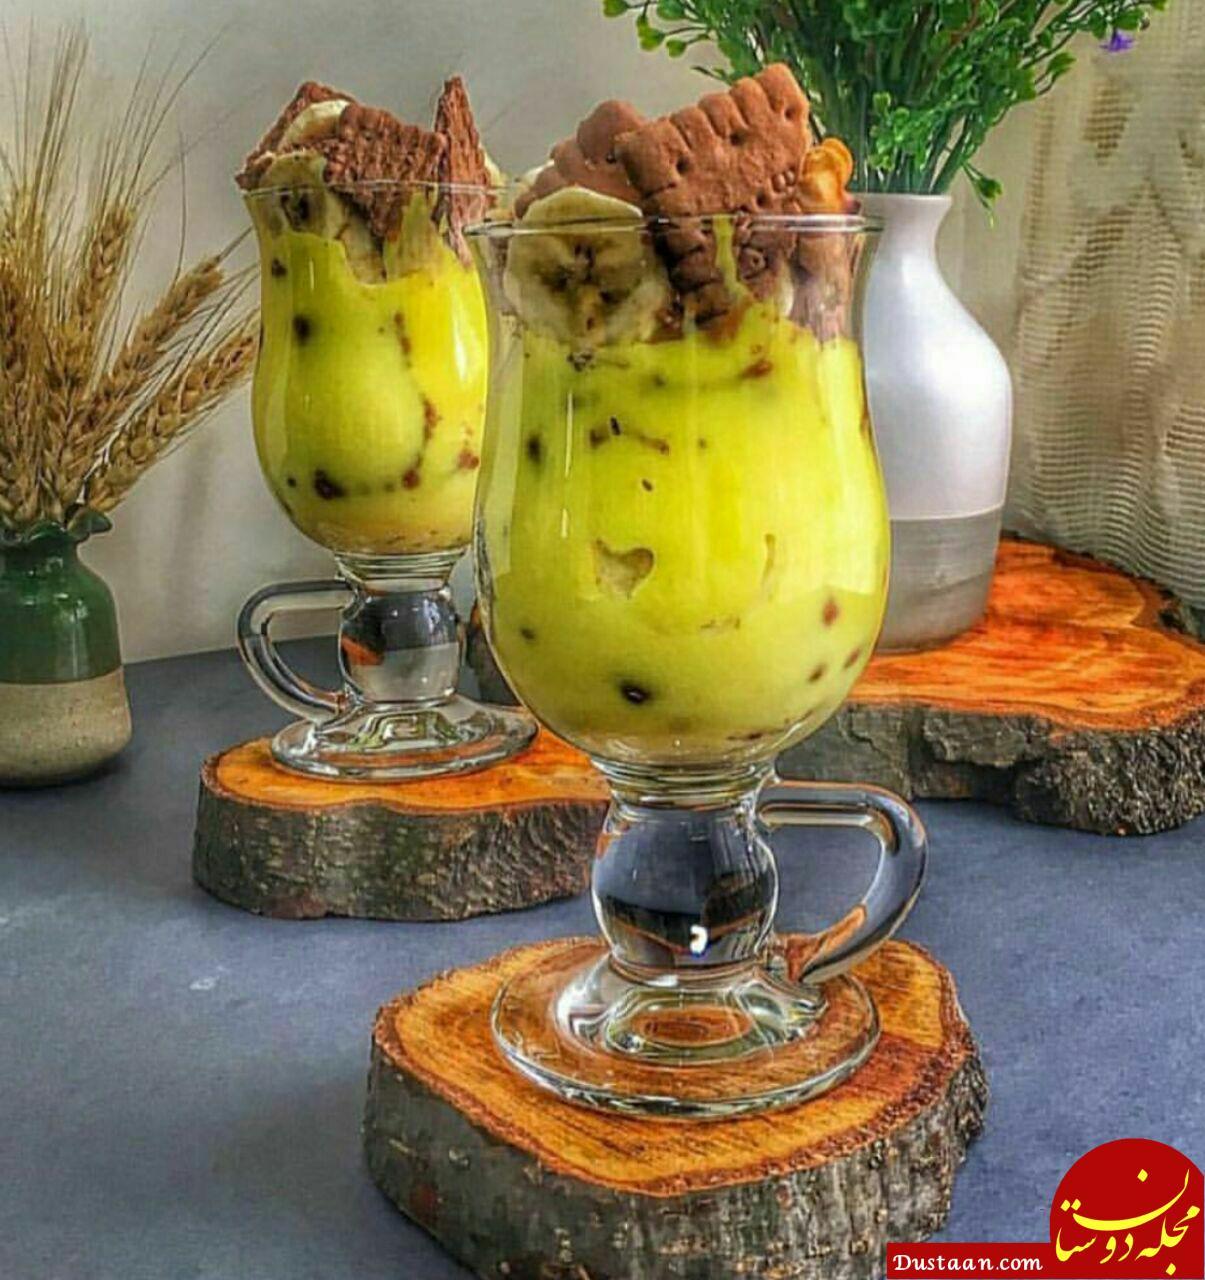 www.dustaan.com طرز تهیه دسر موز و بیسکوییت به سبکی خوشمزه و متفاوت